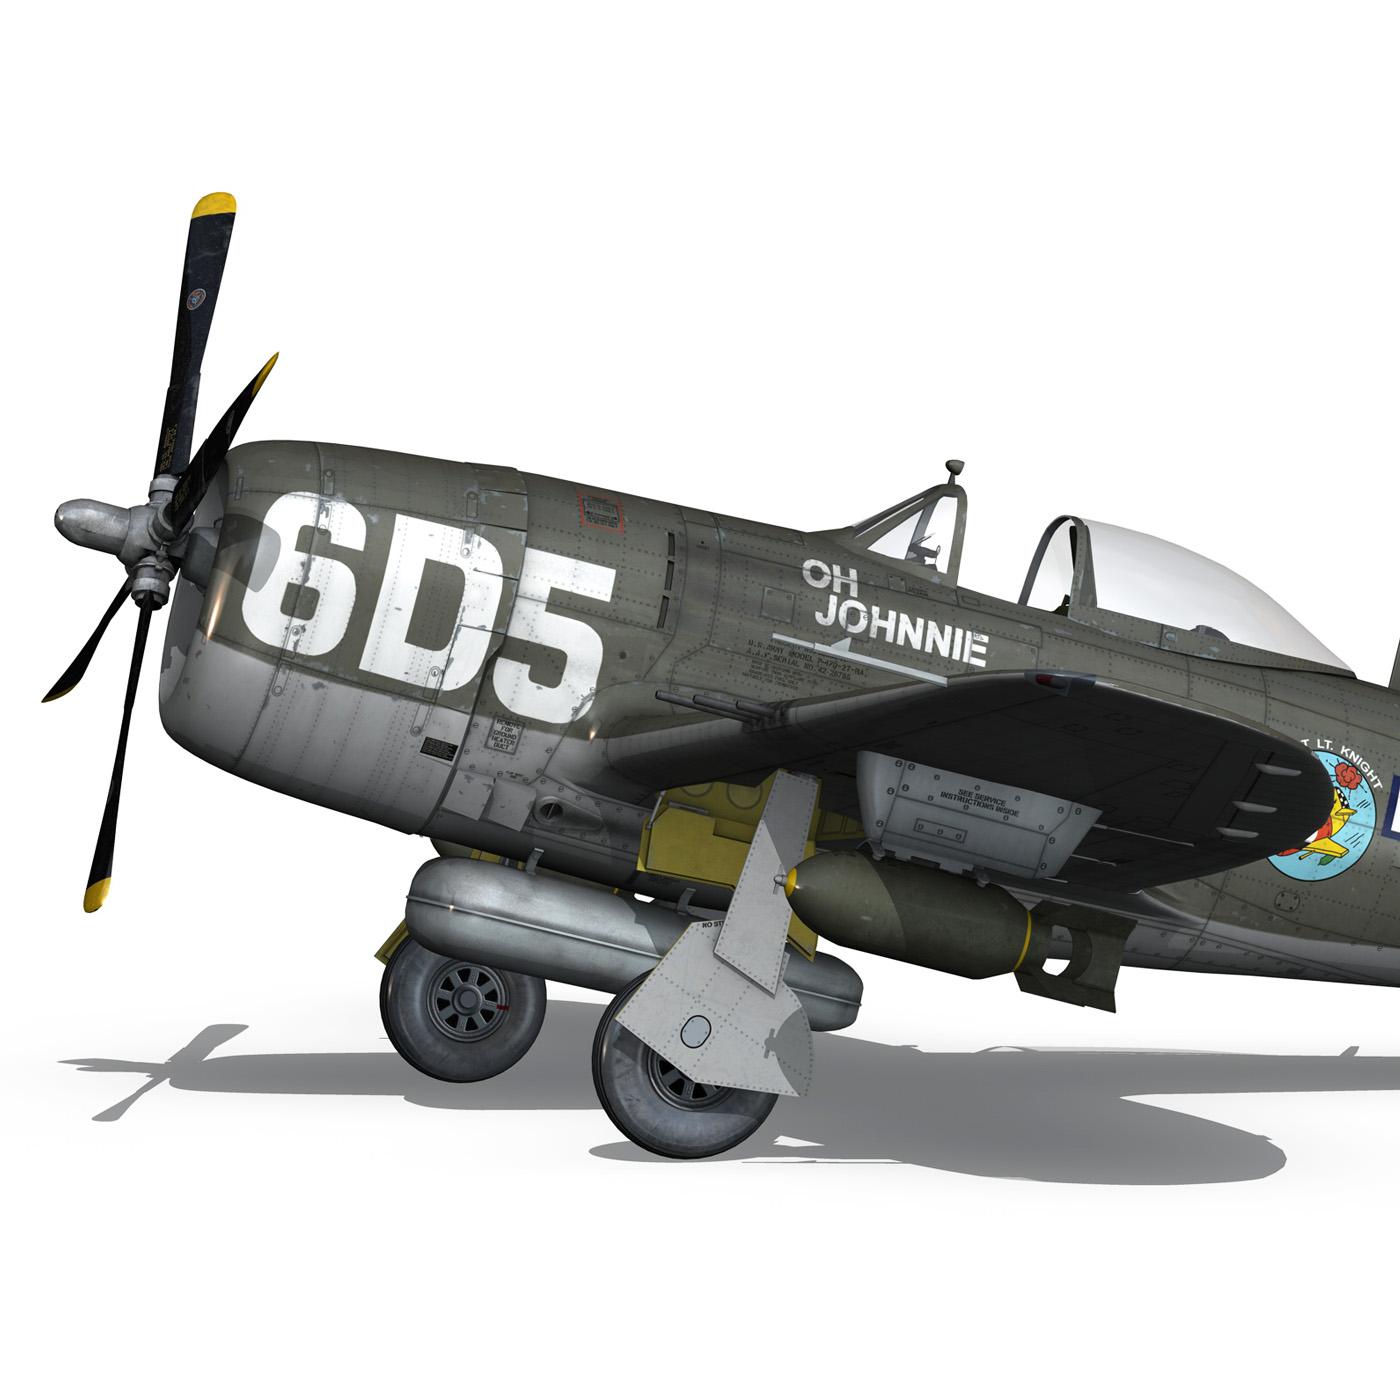 republic p-47 thunderbolt – oh johnnie 3d model fbx c4d lwo obj 274254